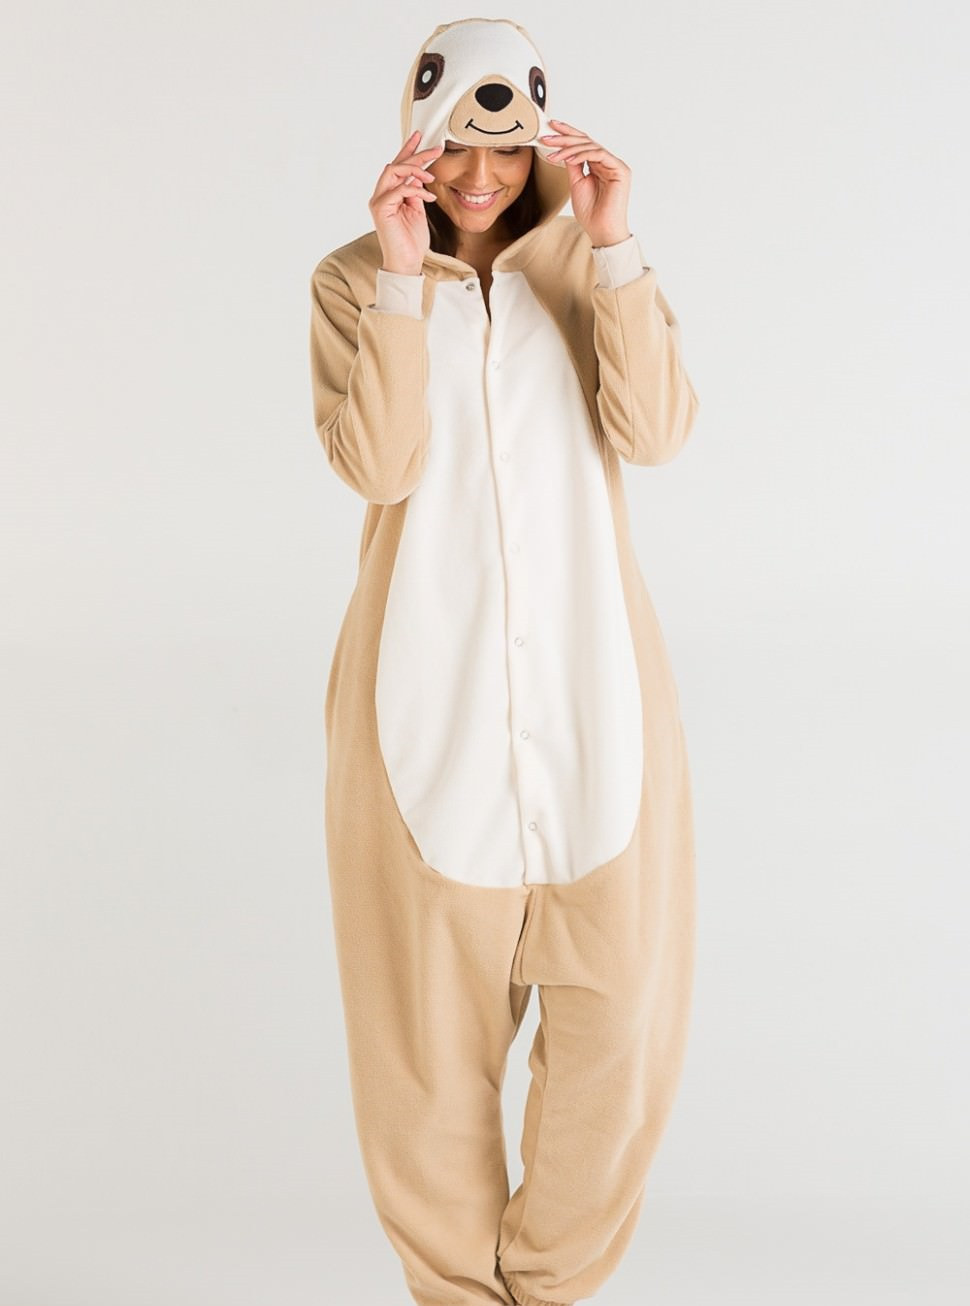 Пижамы Футужама Пижама-кигуруми Ленивец (L) пижамы футужама пижама кигуруми тигр xs